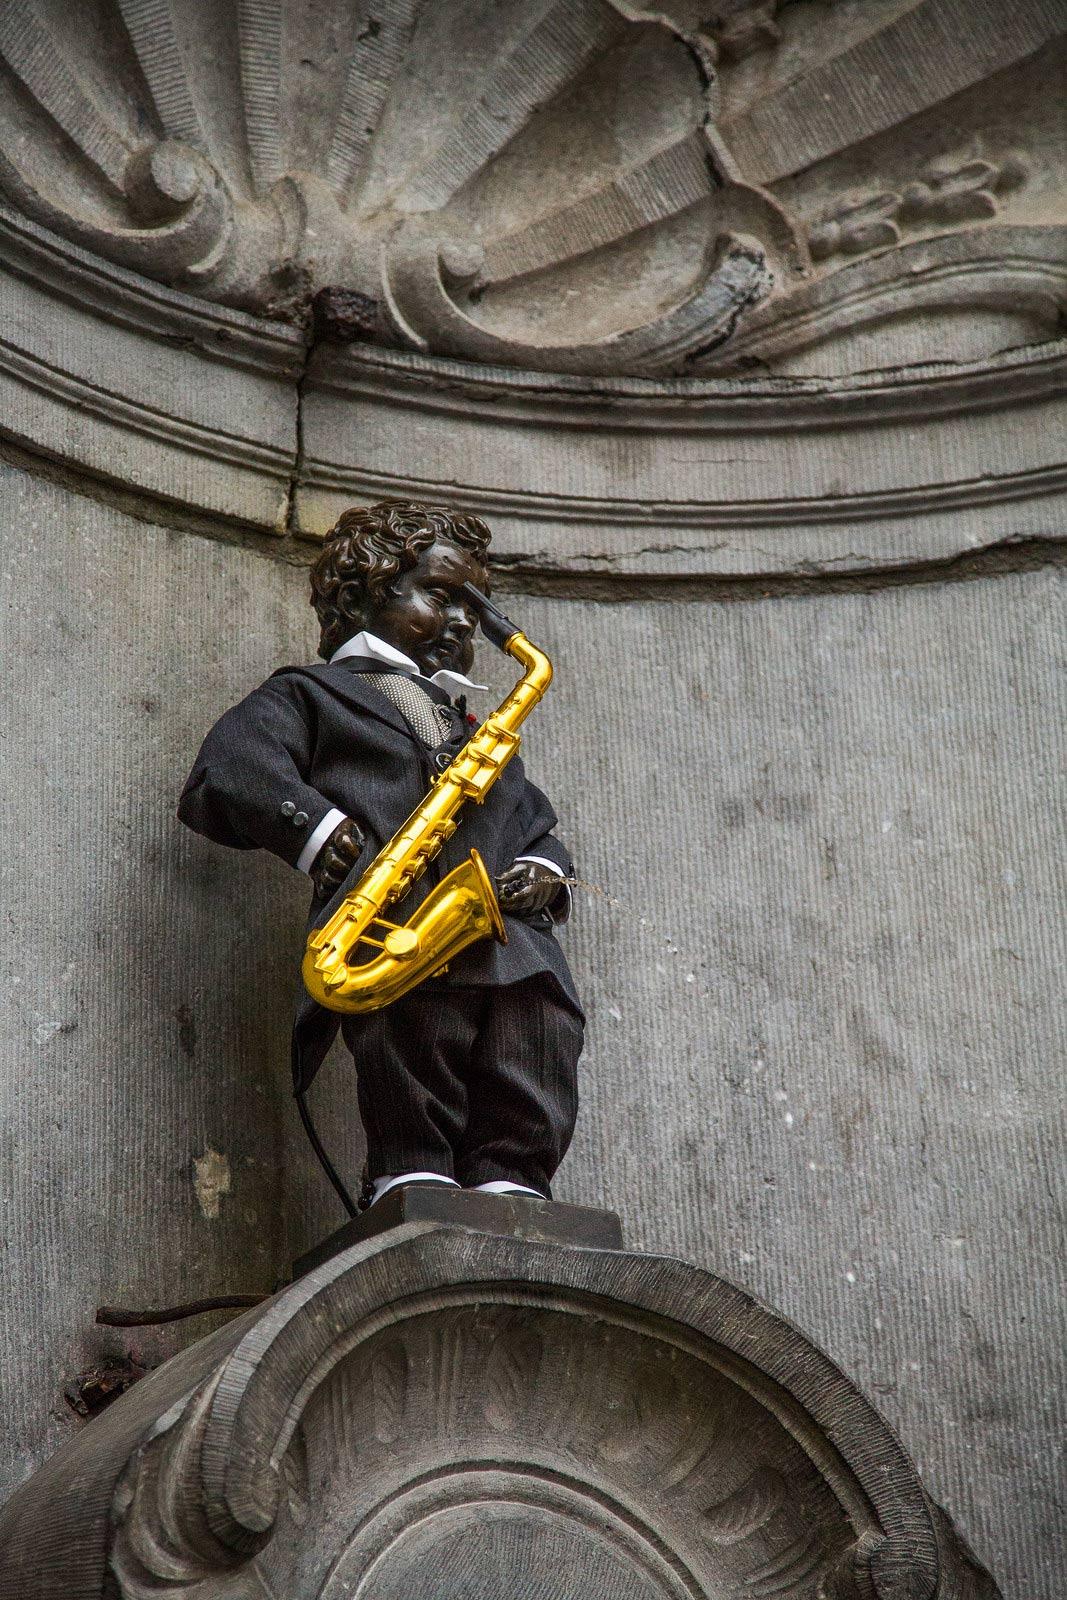 Manneken Pis, Brussels, Belgium, toy saxophone, commemoration of Adolphe Sax, piss on it